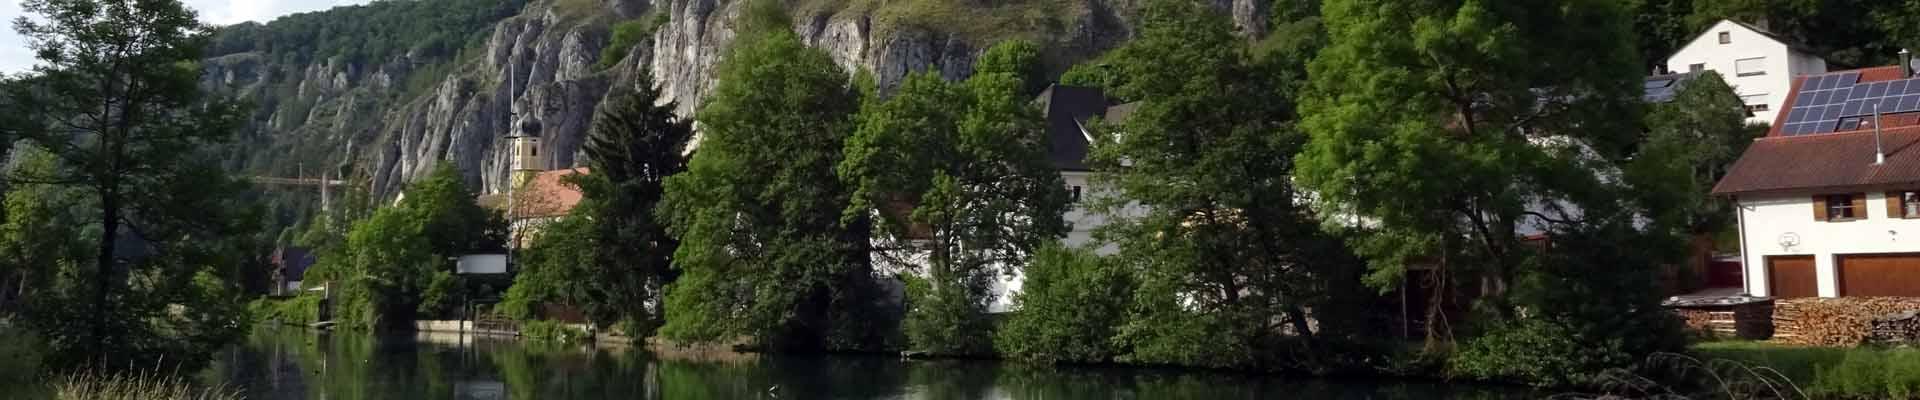 Isar-Donau-Tour - Essing-Kehlheim